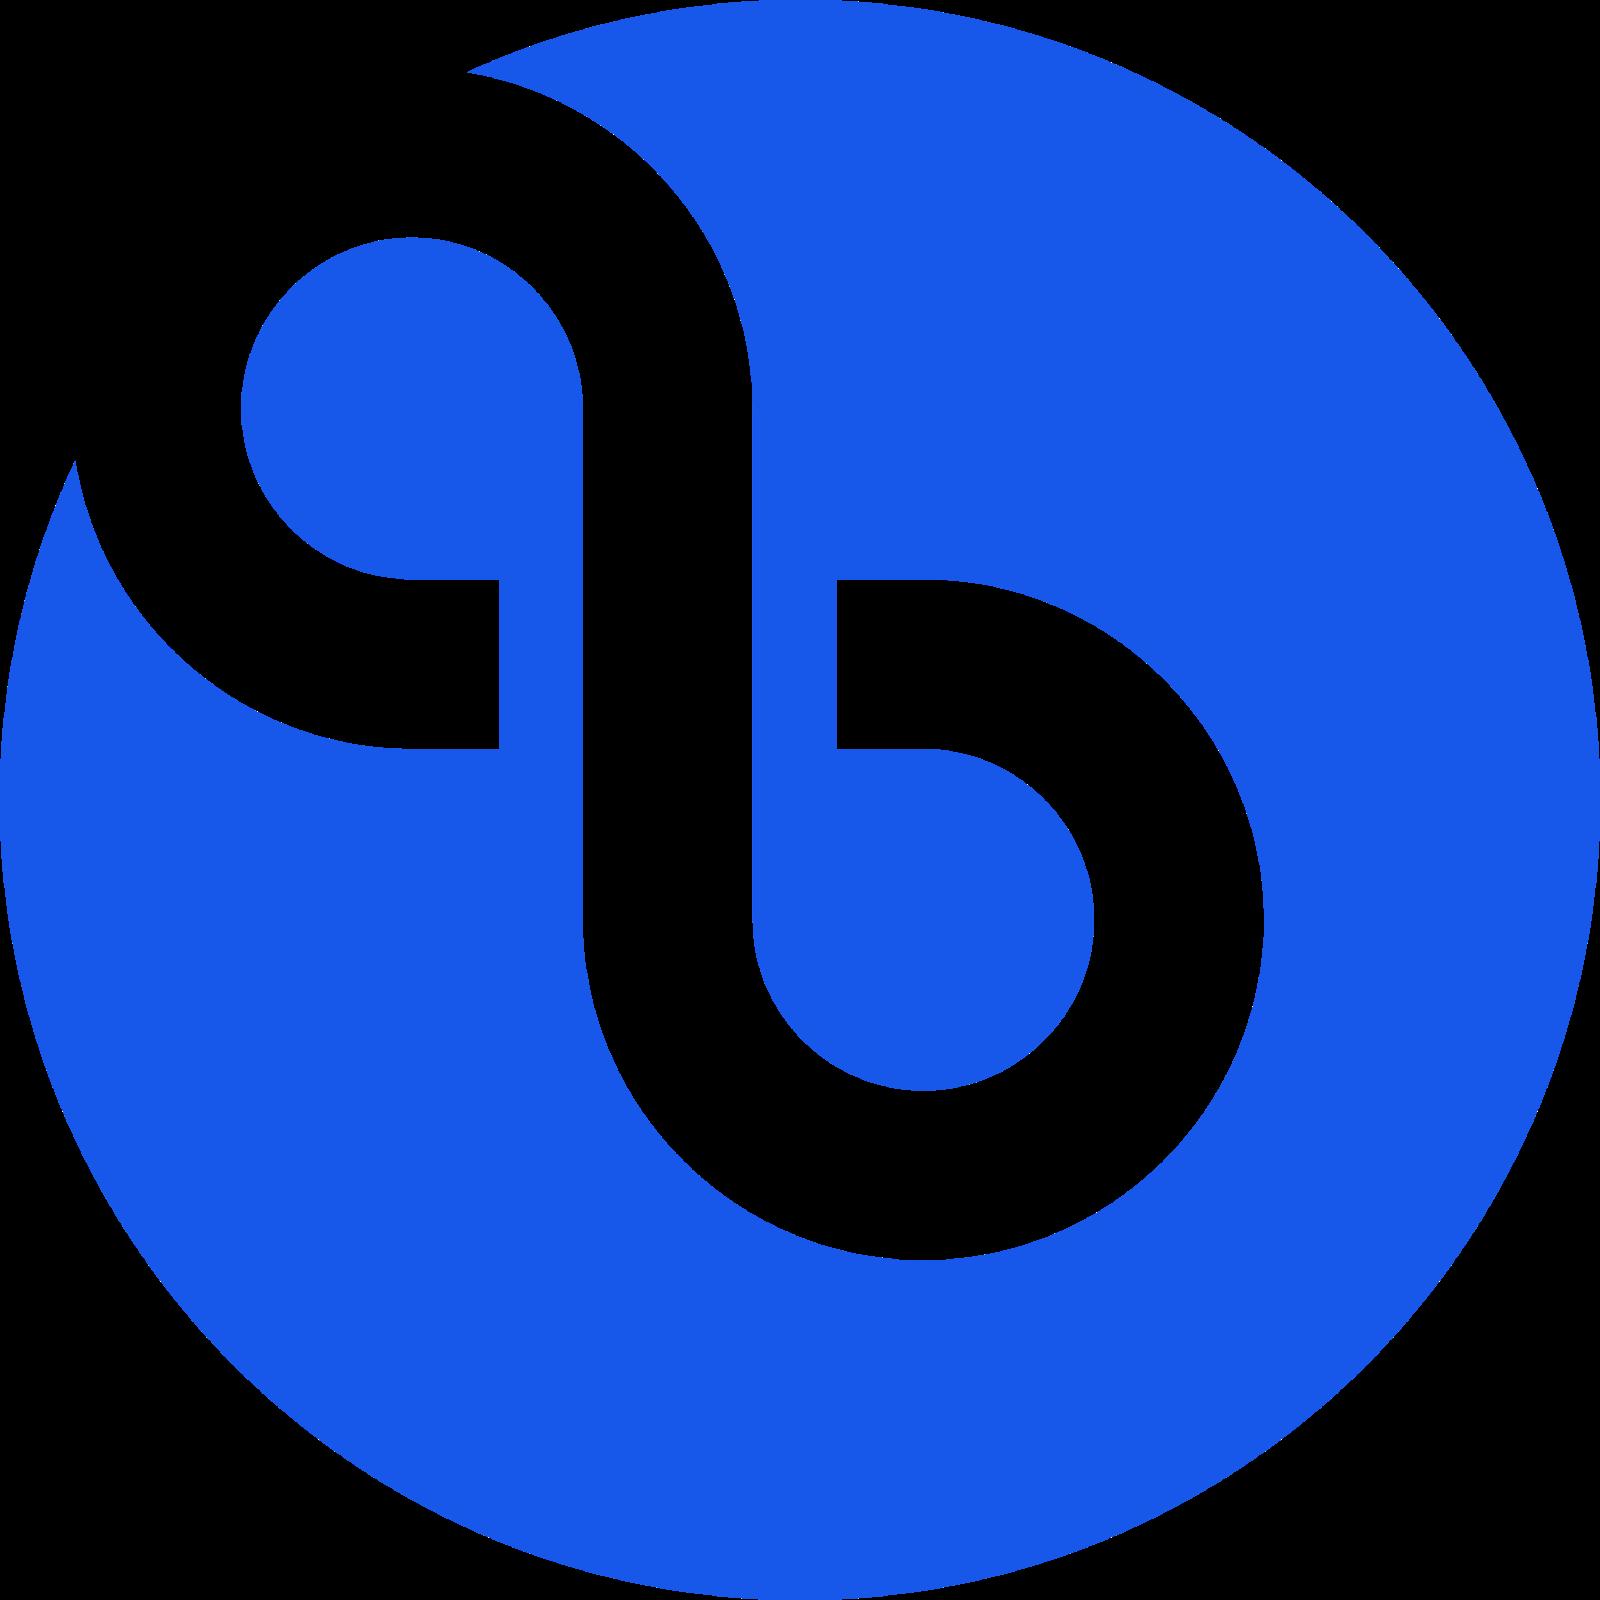 5fff152c4f25da079eaa8b9f bepro logo logomark blue no shading